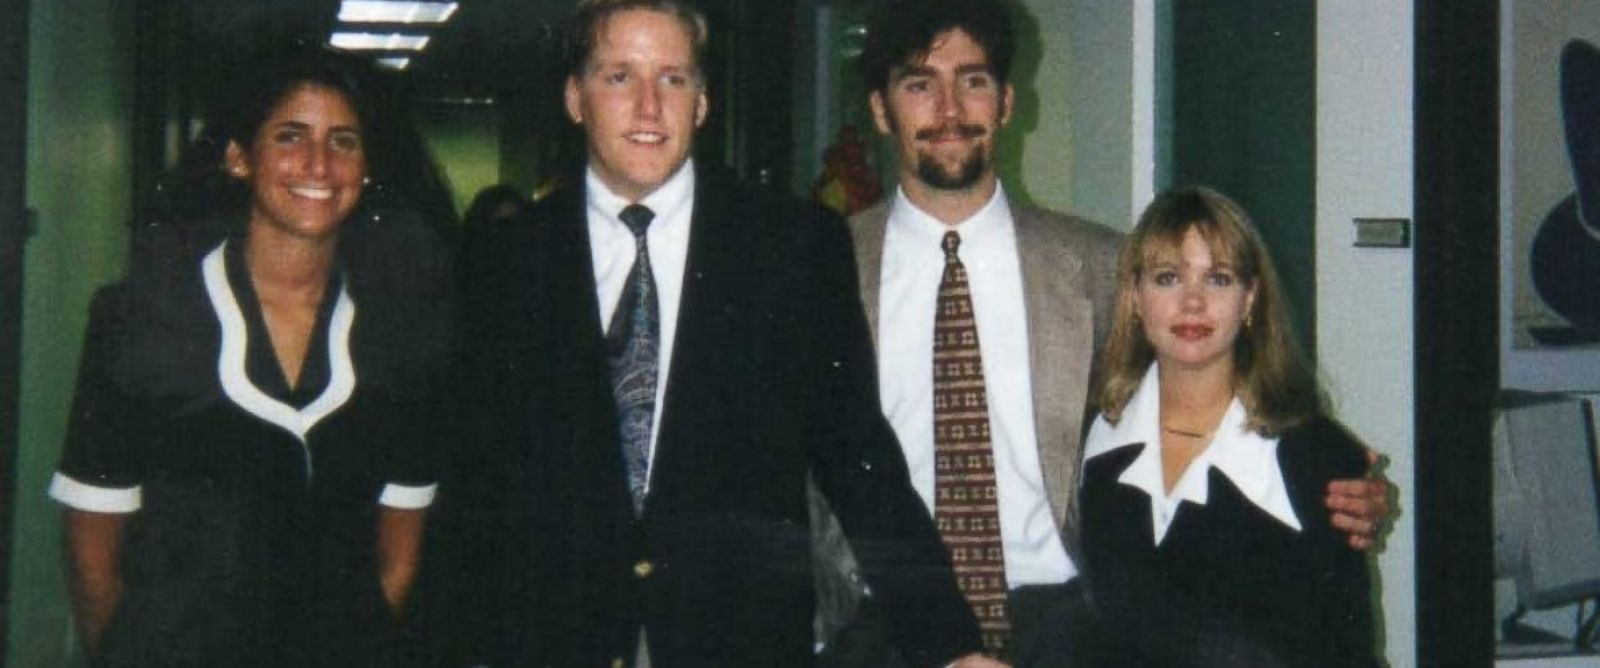 PHOTO: Advertising interns in 1995.